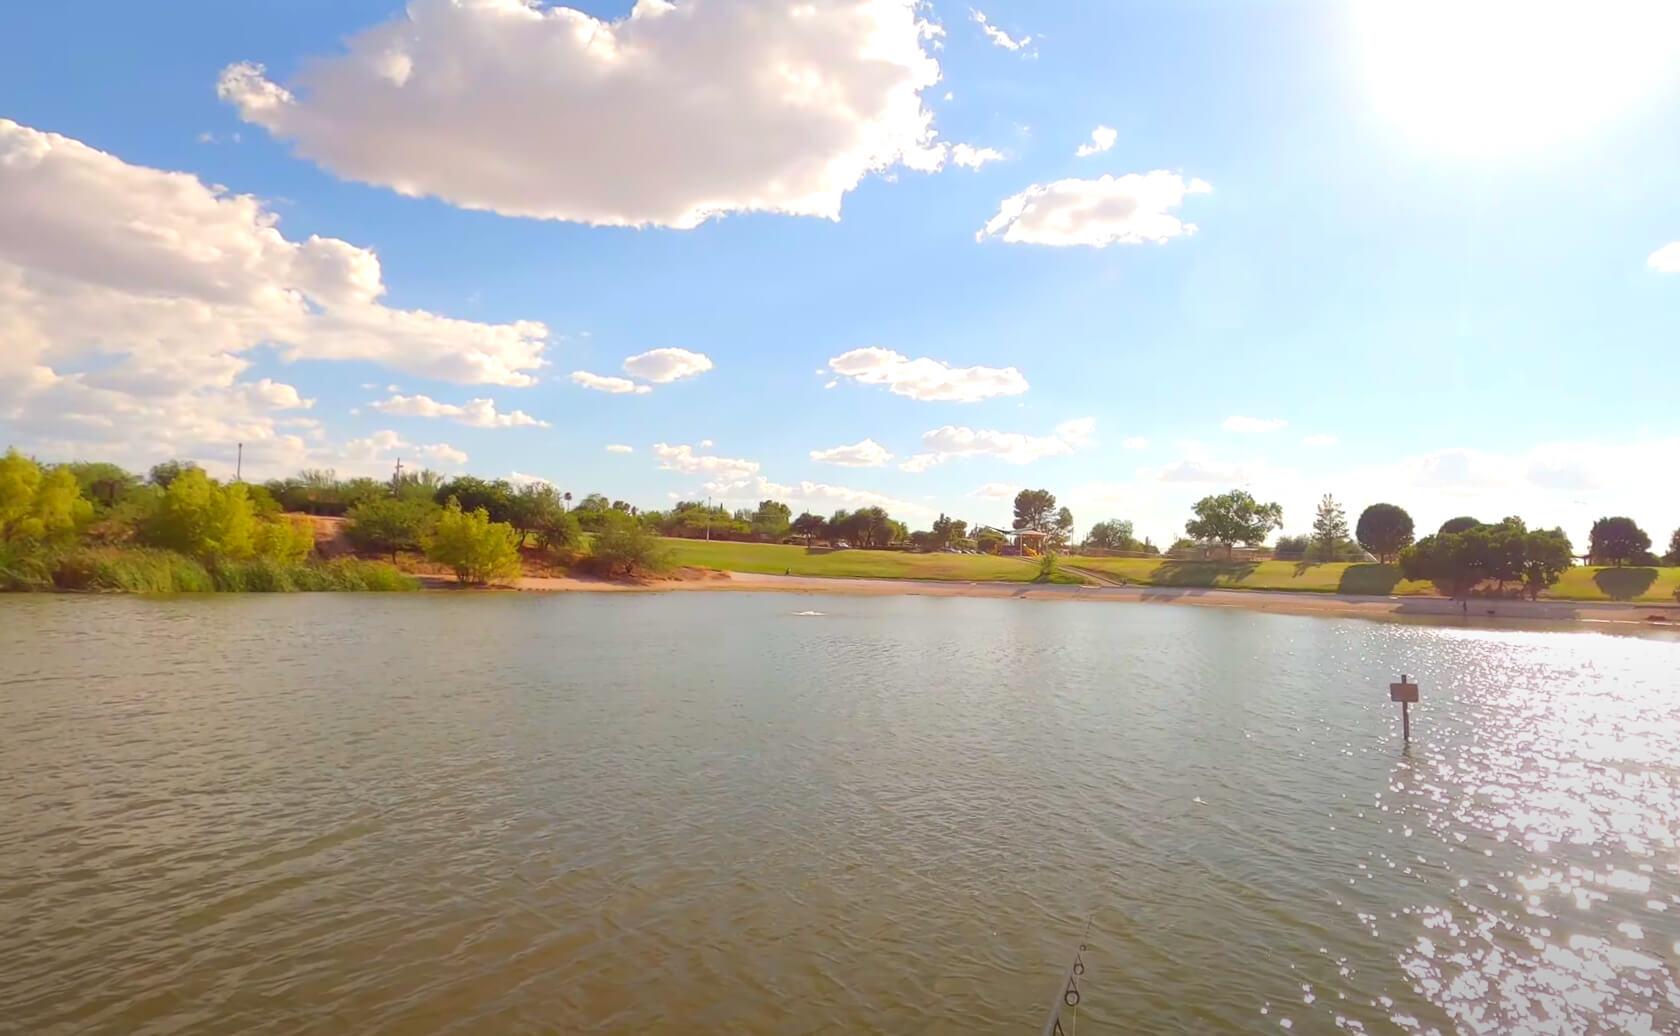 Lakeside-Lake-Fishing-Guide-Tucson-AZ-05